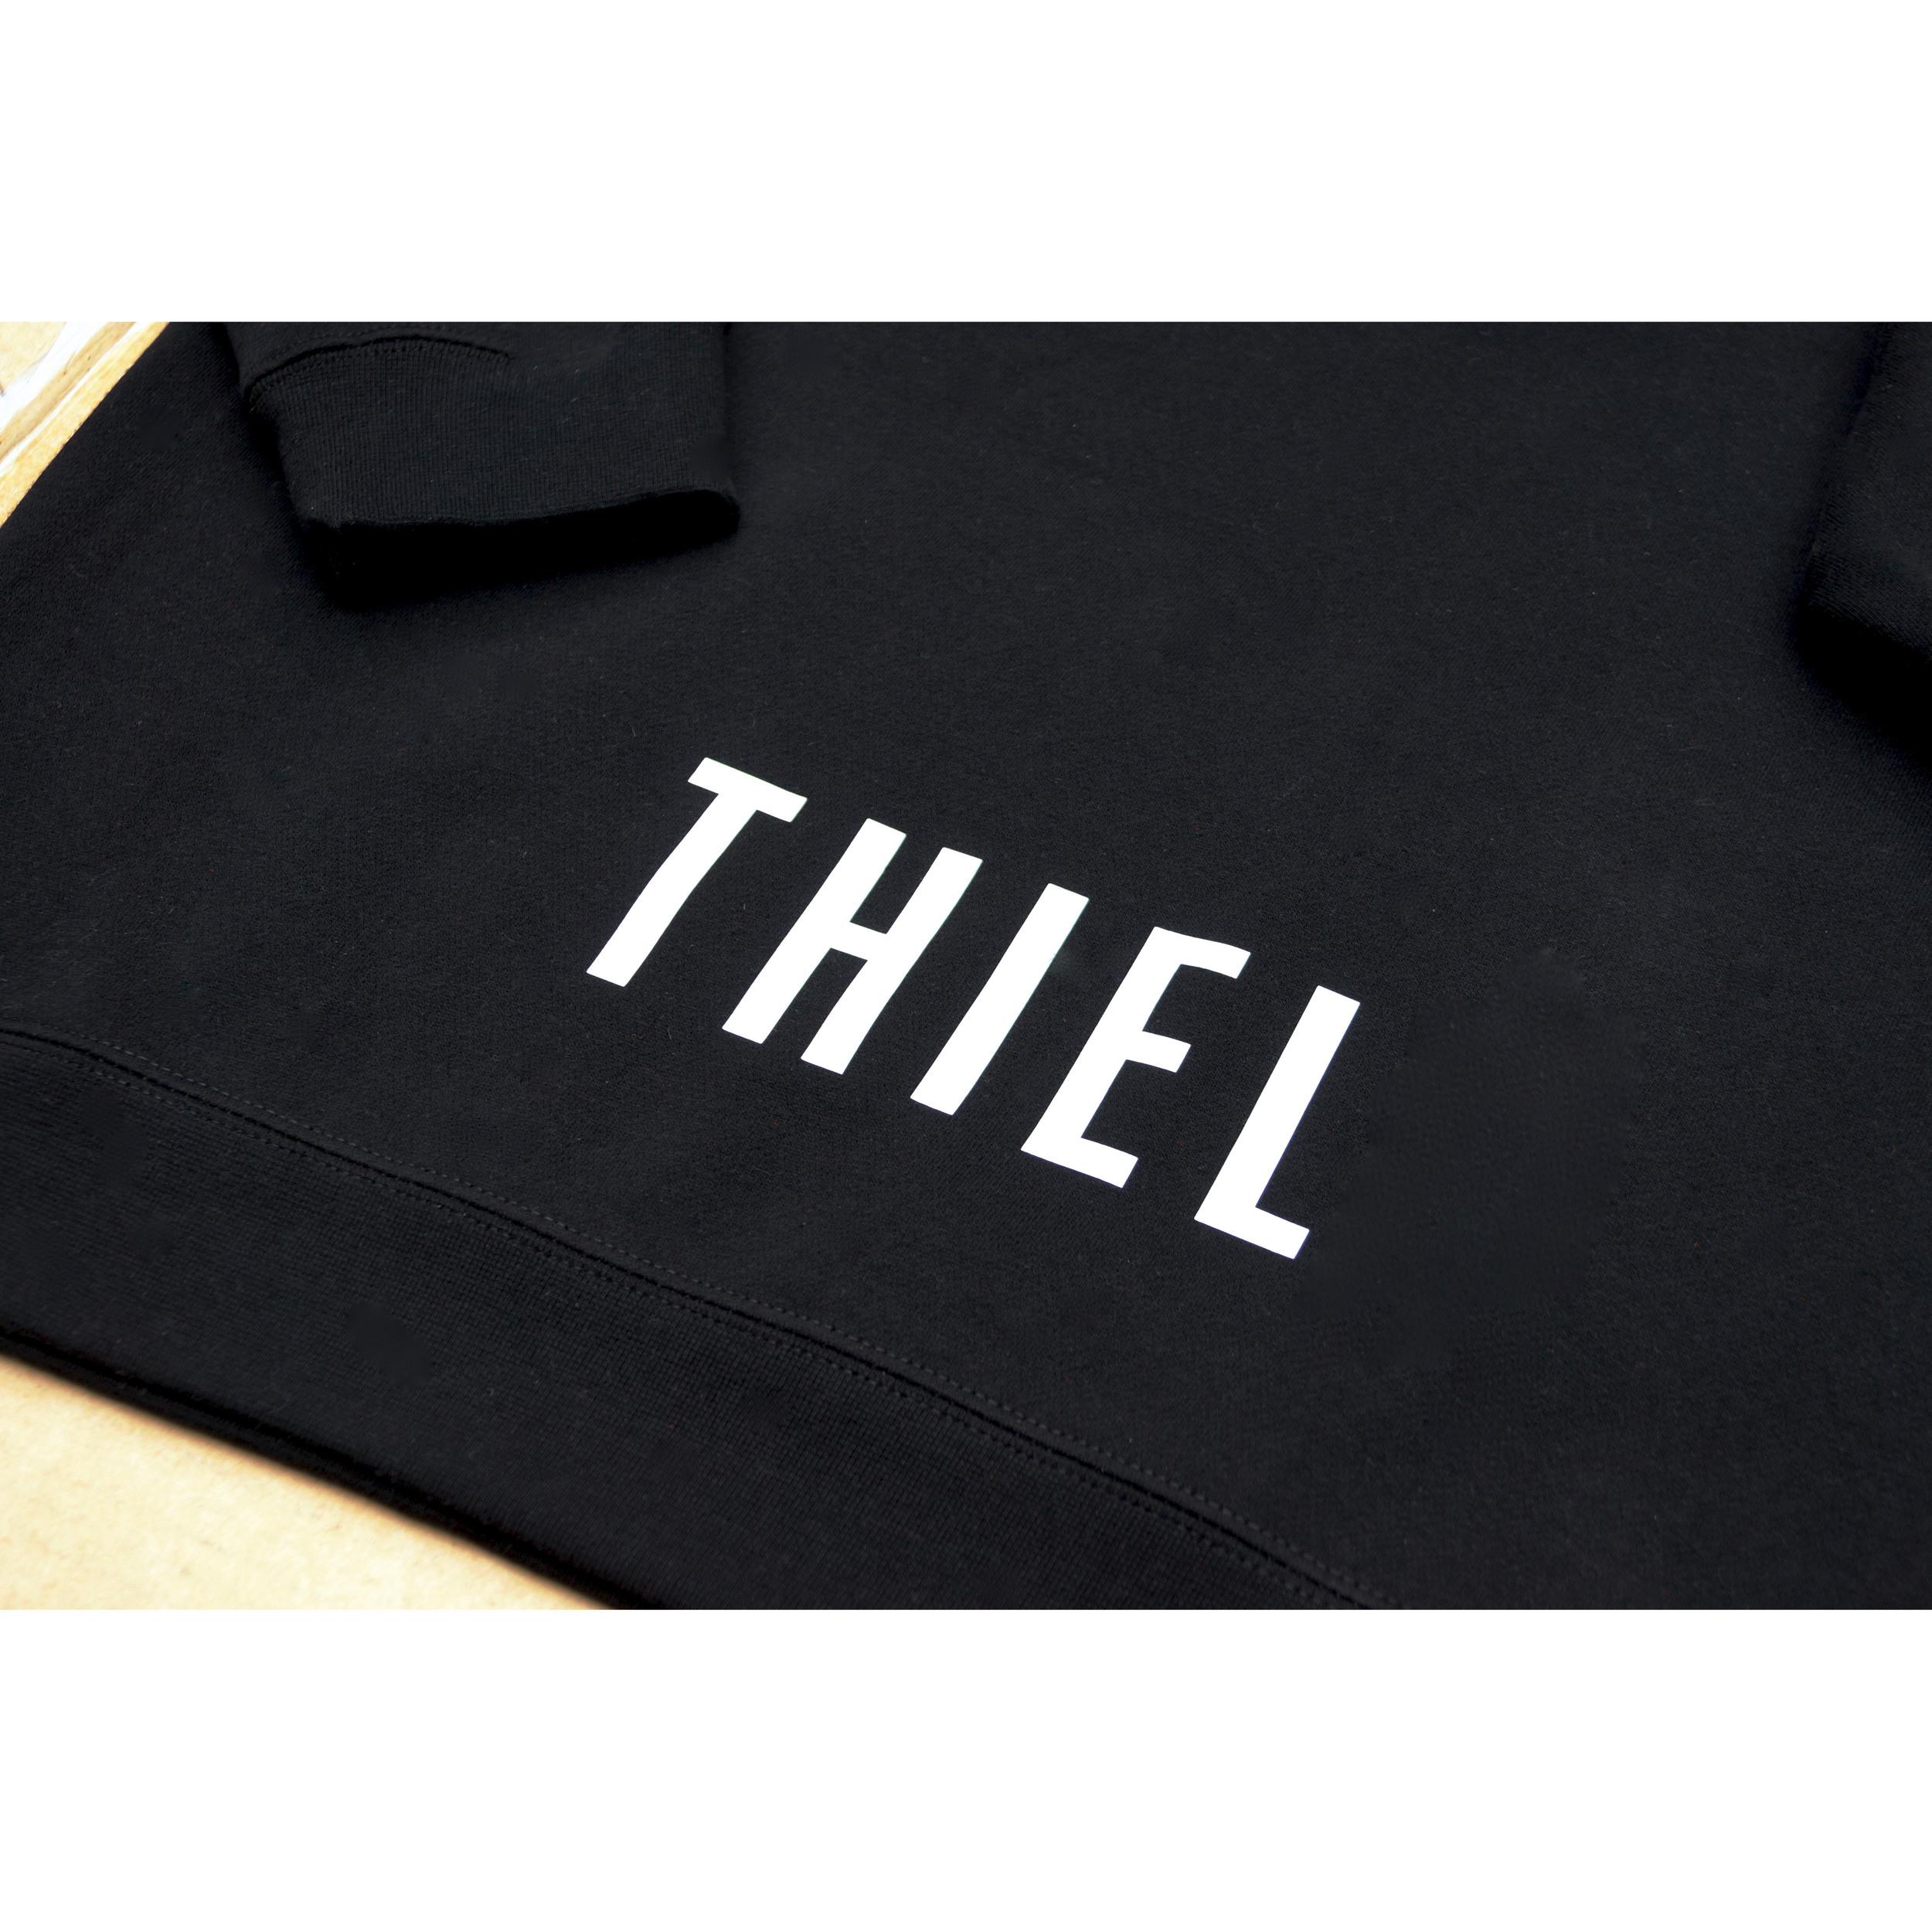 THIEL SS.jpg